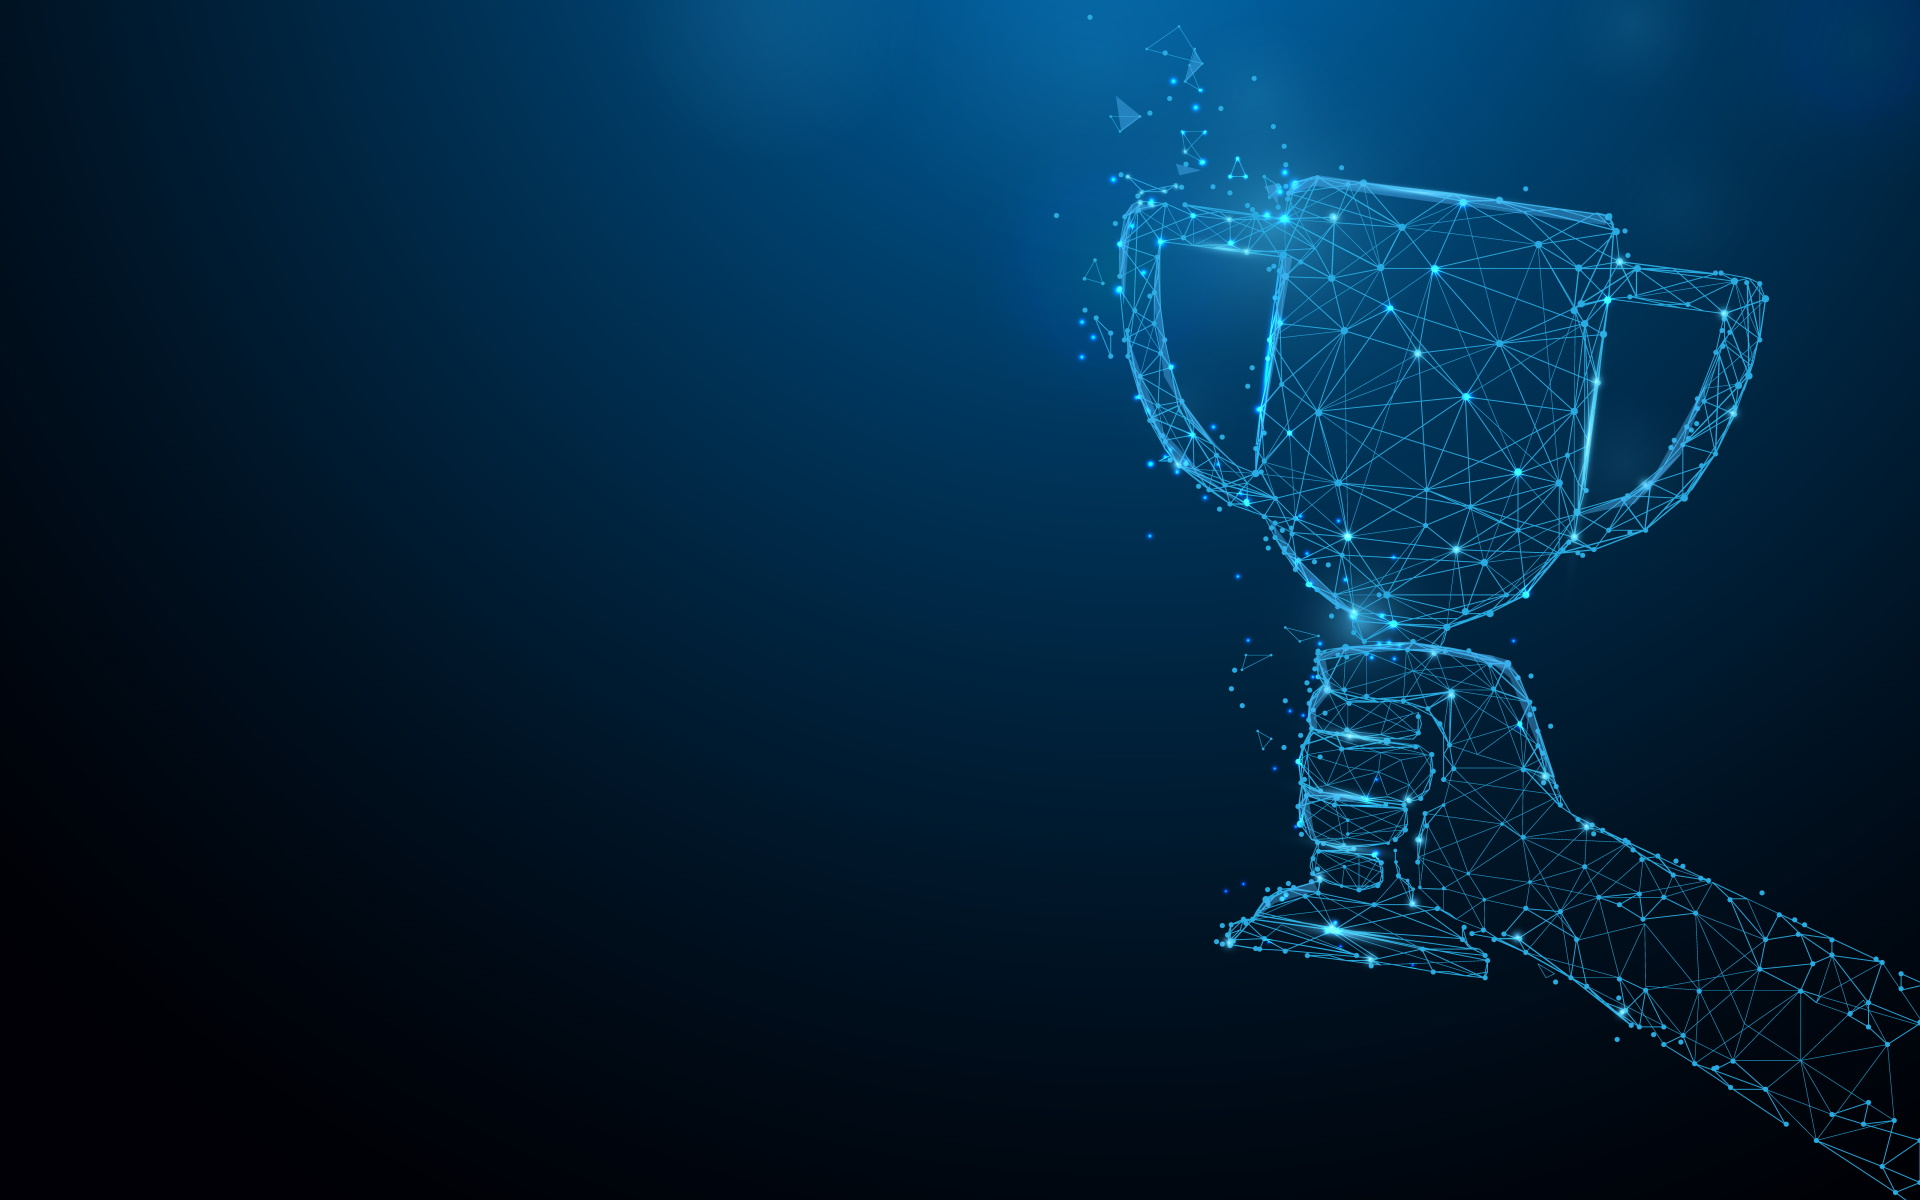 Bitdefender, Ranked #1 In AV-Test Results Halfway Into 2020